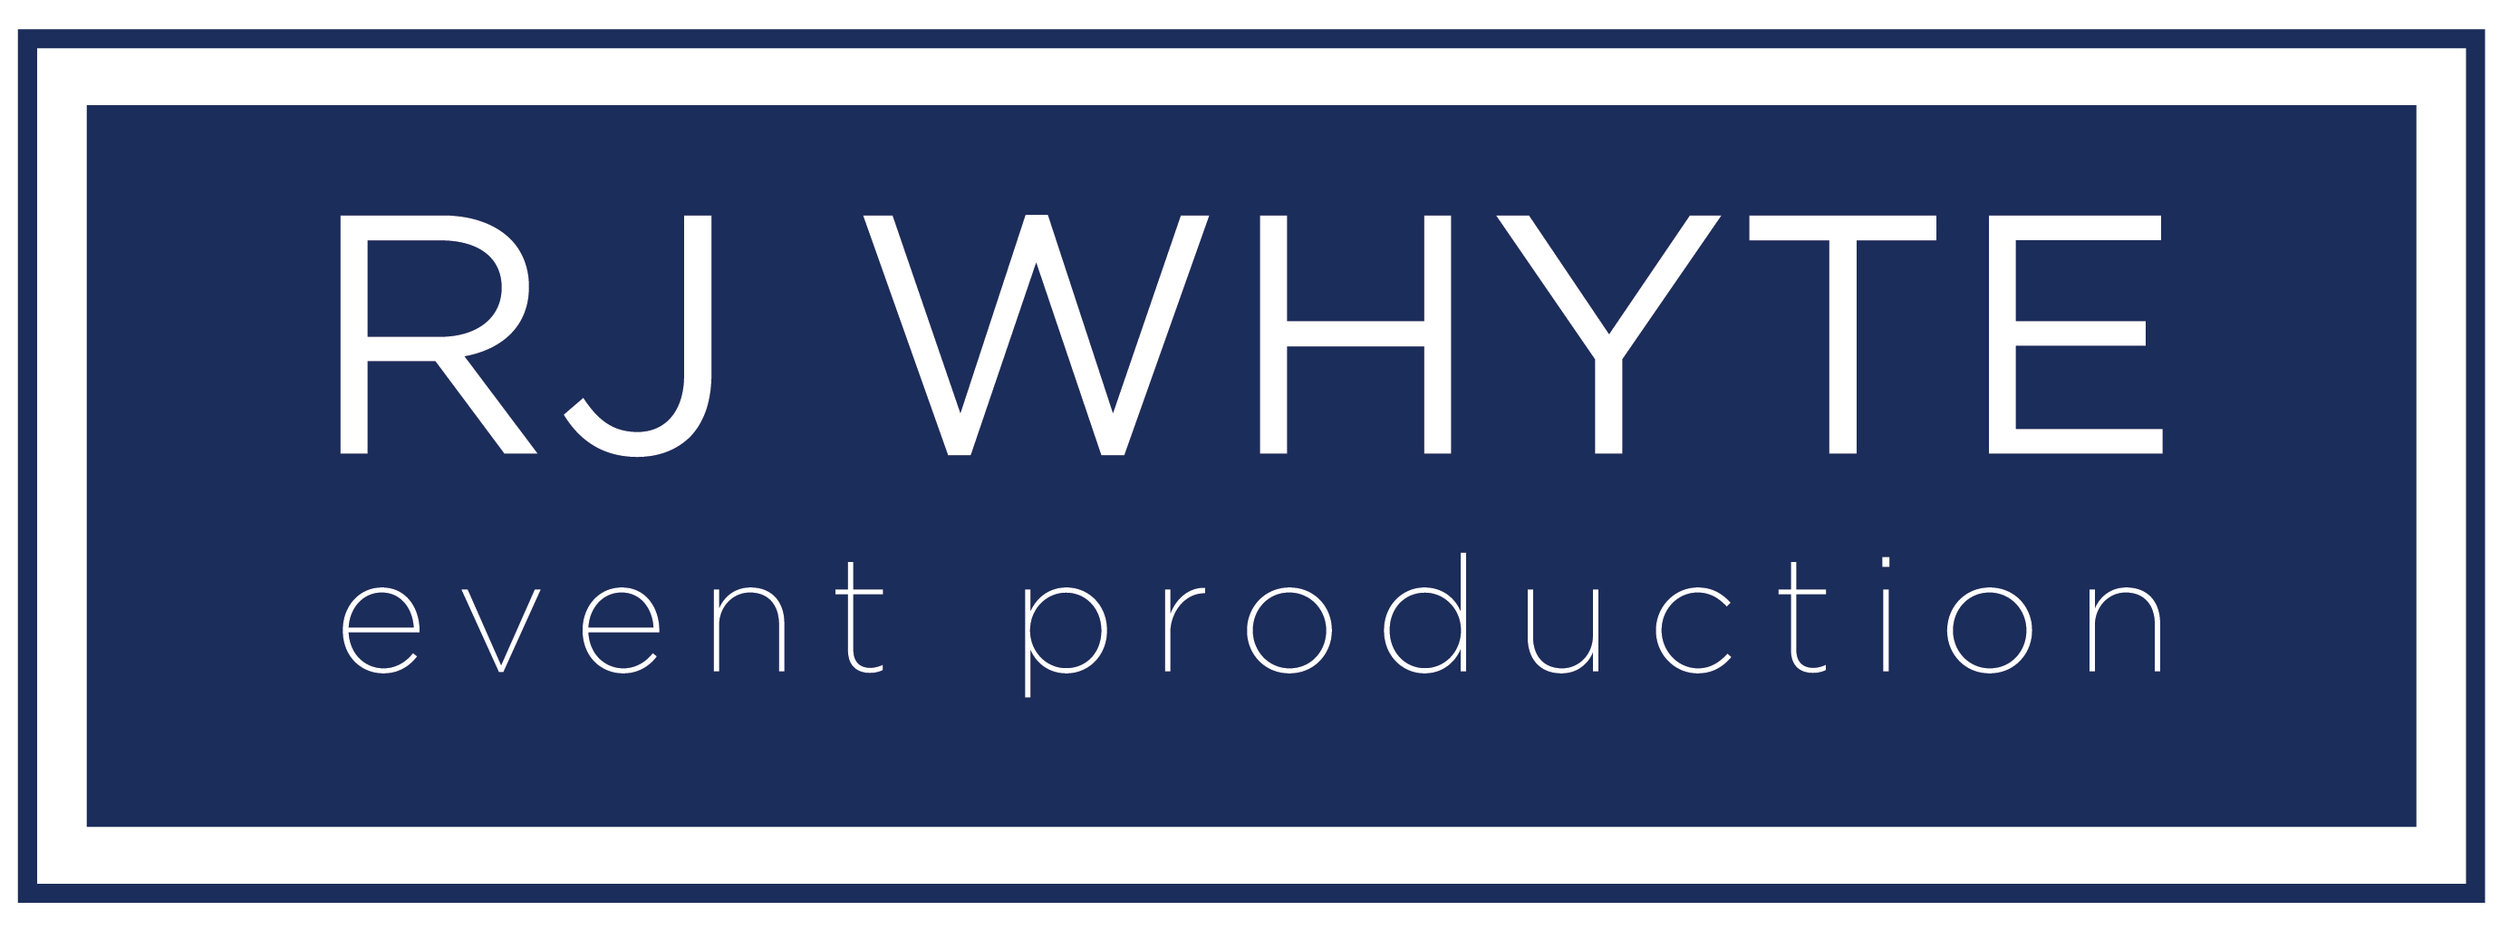 RJ Whte Logo.jpg